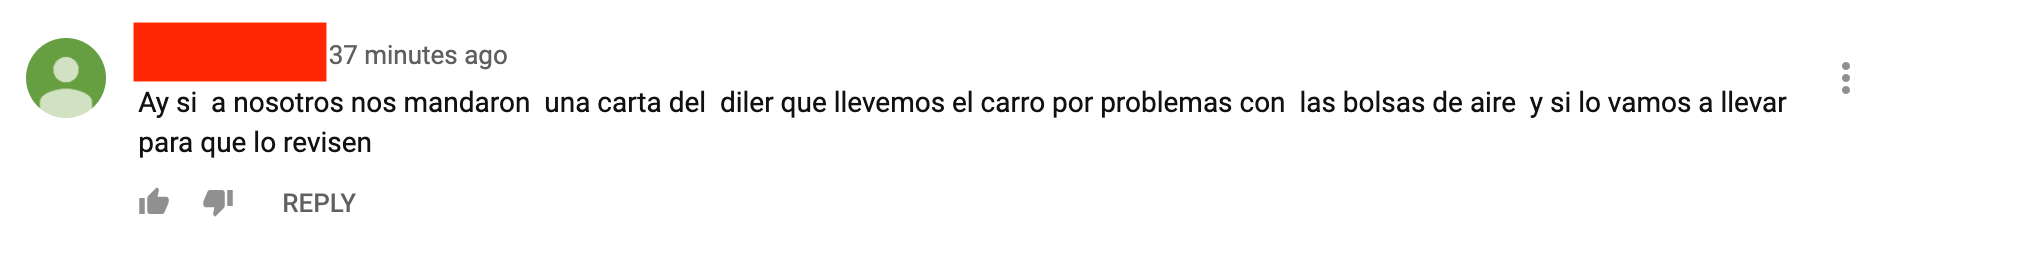 comment 2.png